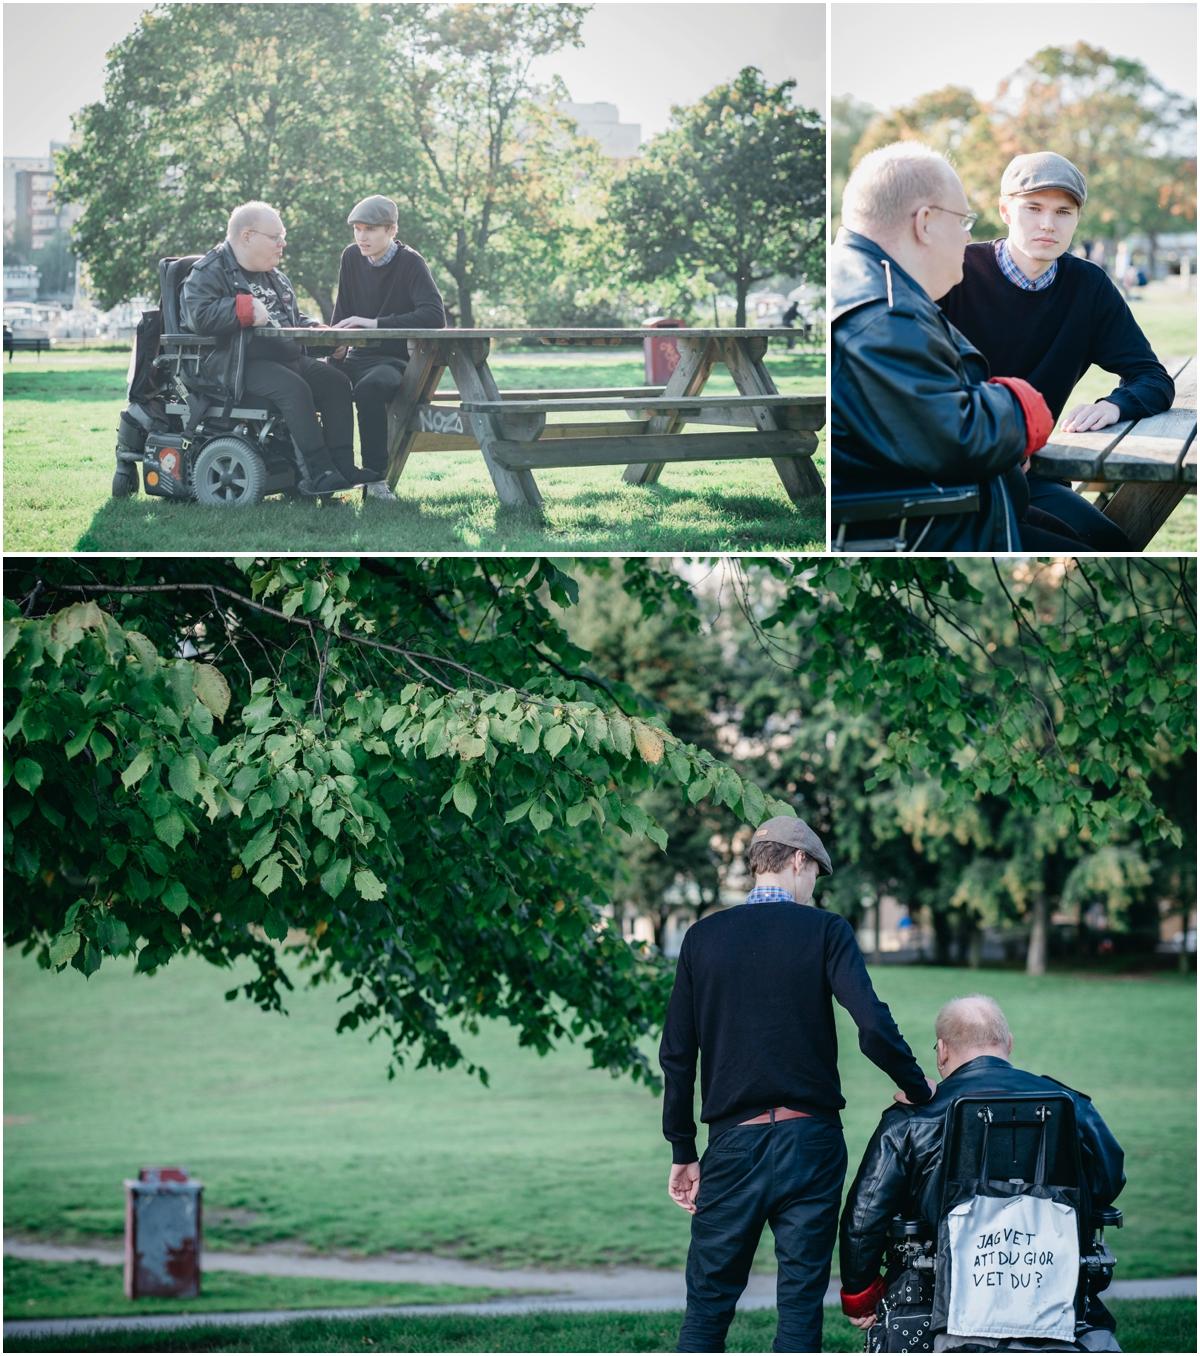 360You-photography-foretagsfotograf-foretagsportratt-stockholm-vallentuna-taby-bildbank-personalportratt-MIND-5.jpg